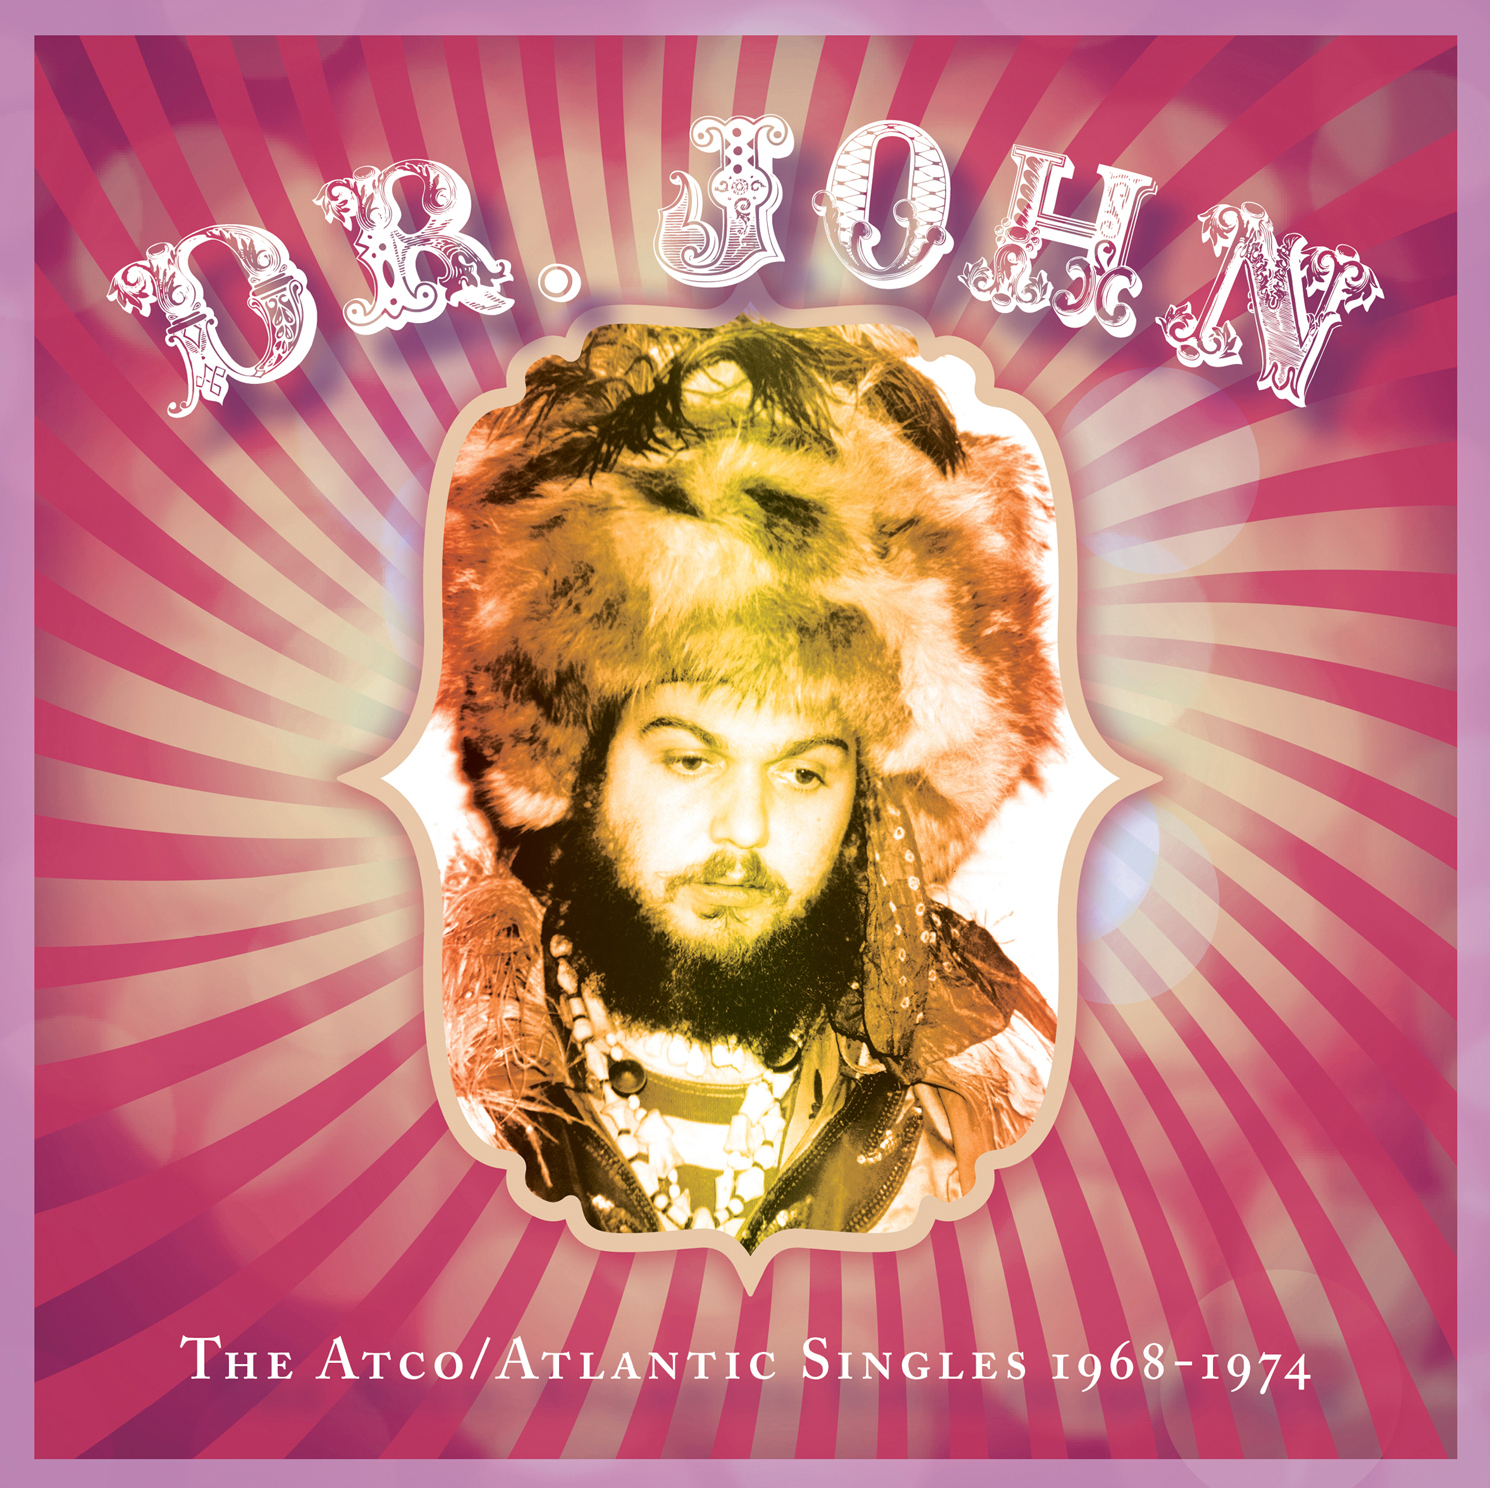 Dr. John -The Atco/Atlantic Singles 1968–1974  Release Date: September 18, 2015 Label: Omnivore Recordings  SERVICE: Restoration, Mastering NUMBER OF DISCS: 1 GENRE: Rock FORMAT: CD